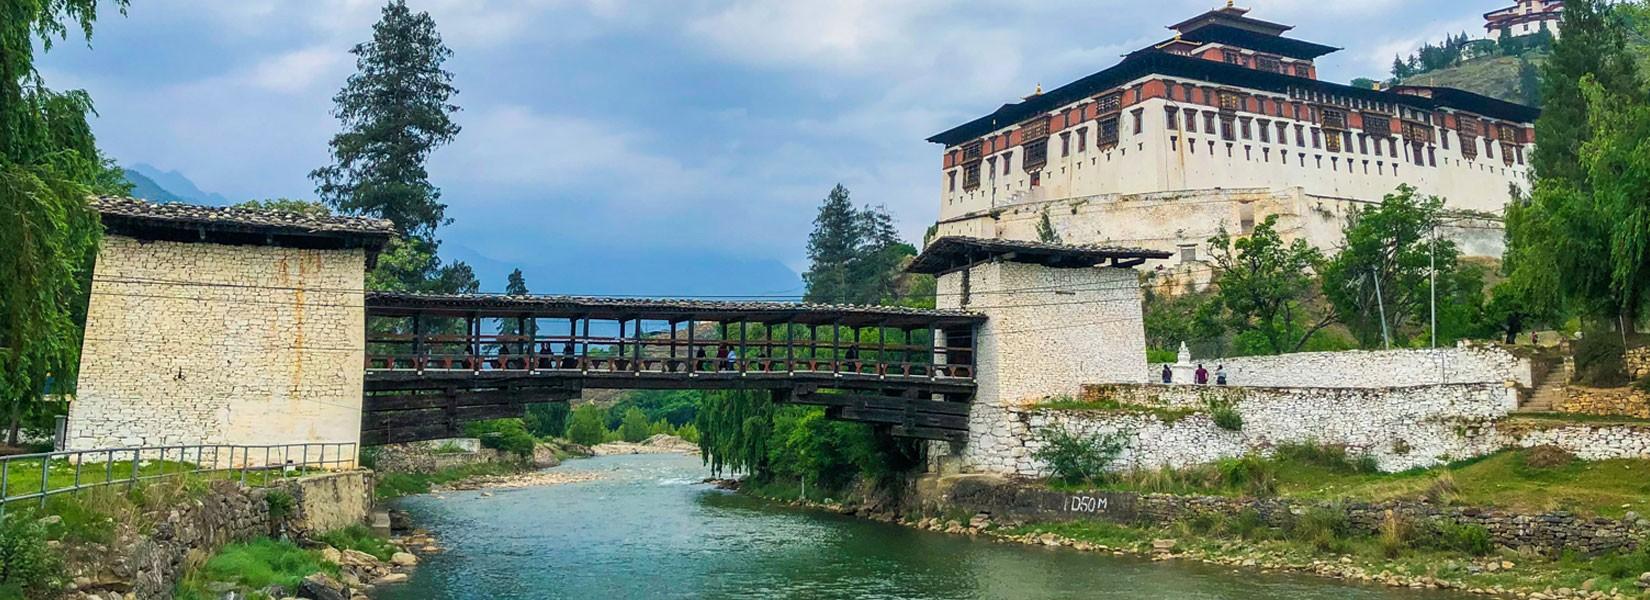 BhutanTour Information